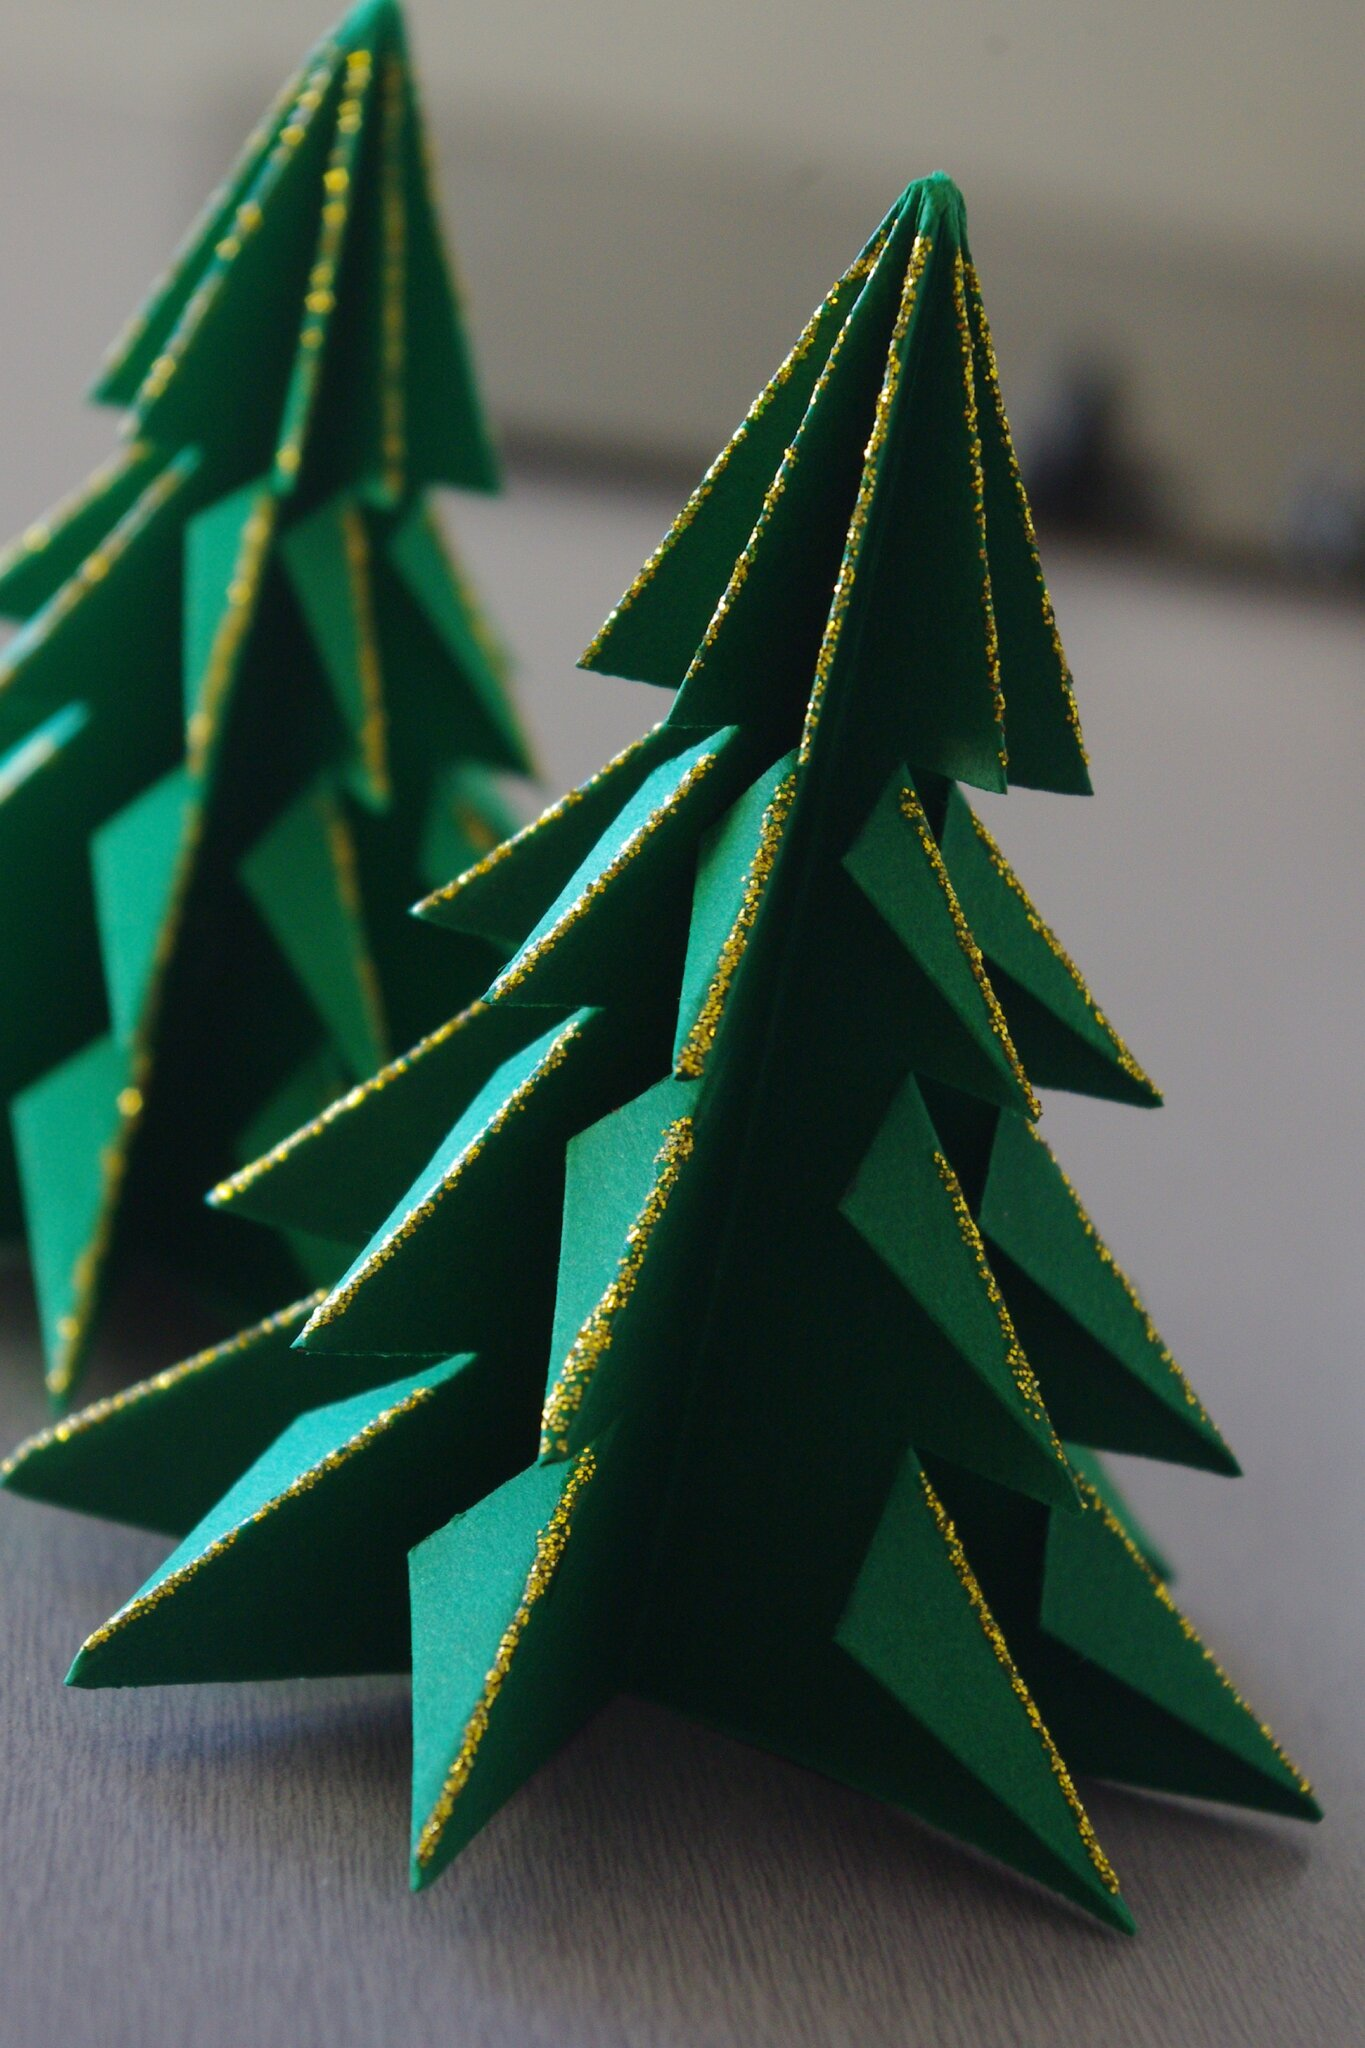 Jour 1 sapin en origami ma petite bulle de gourmandise - Sapin en papier origami ...